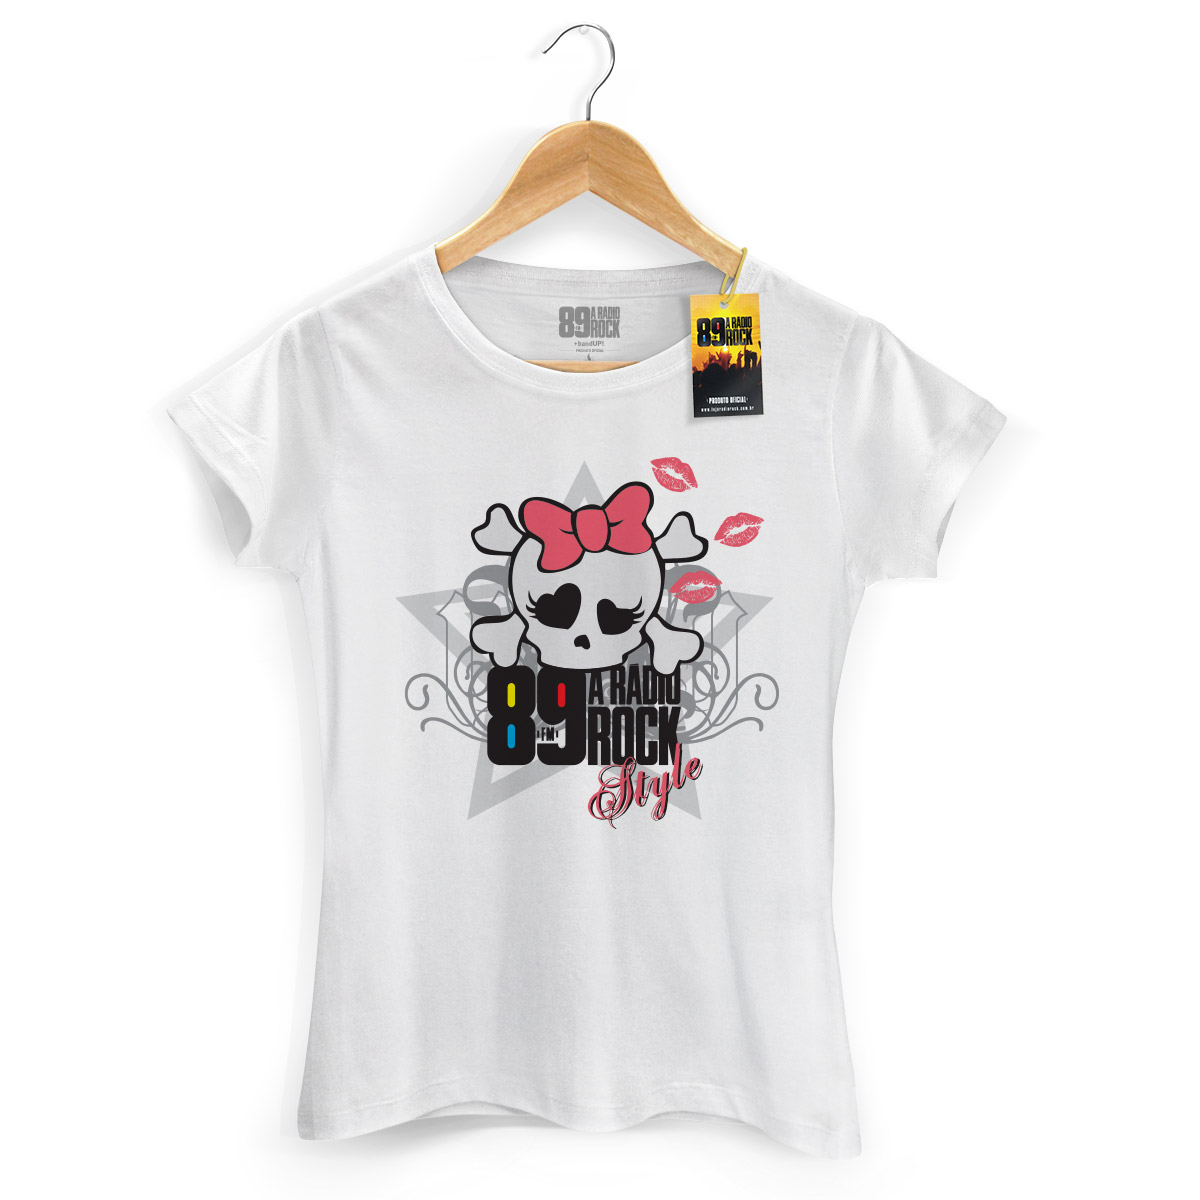 Camiseta Feminina 89 FM Skull Girl